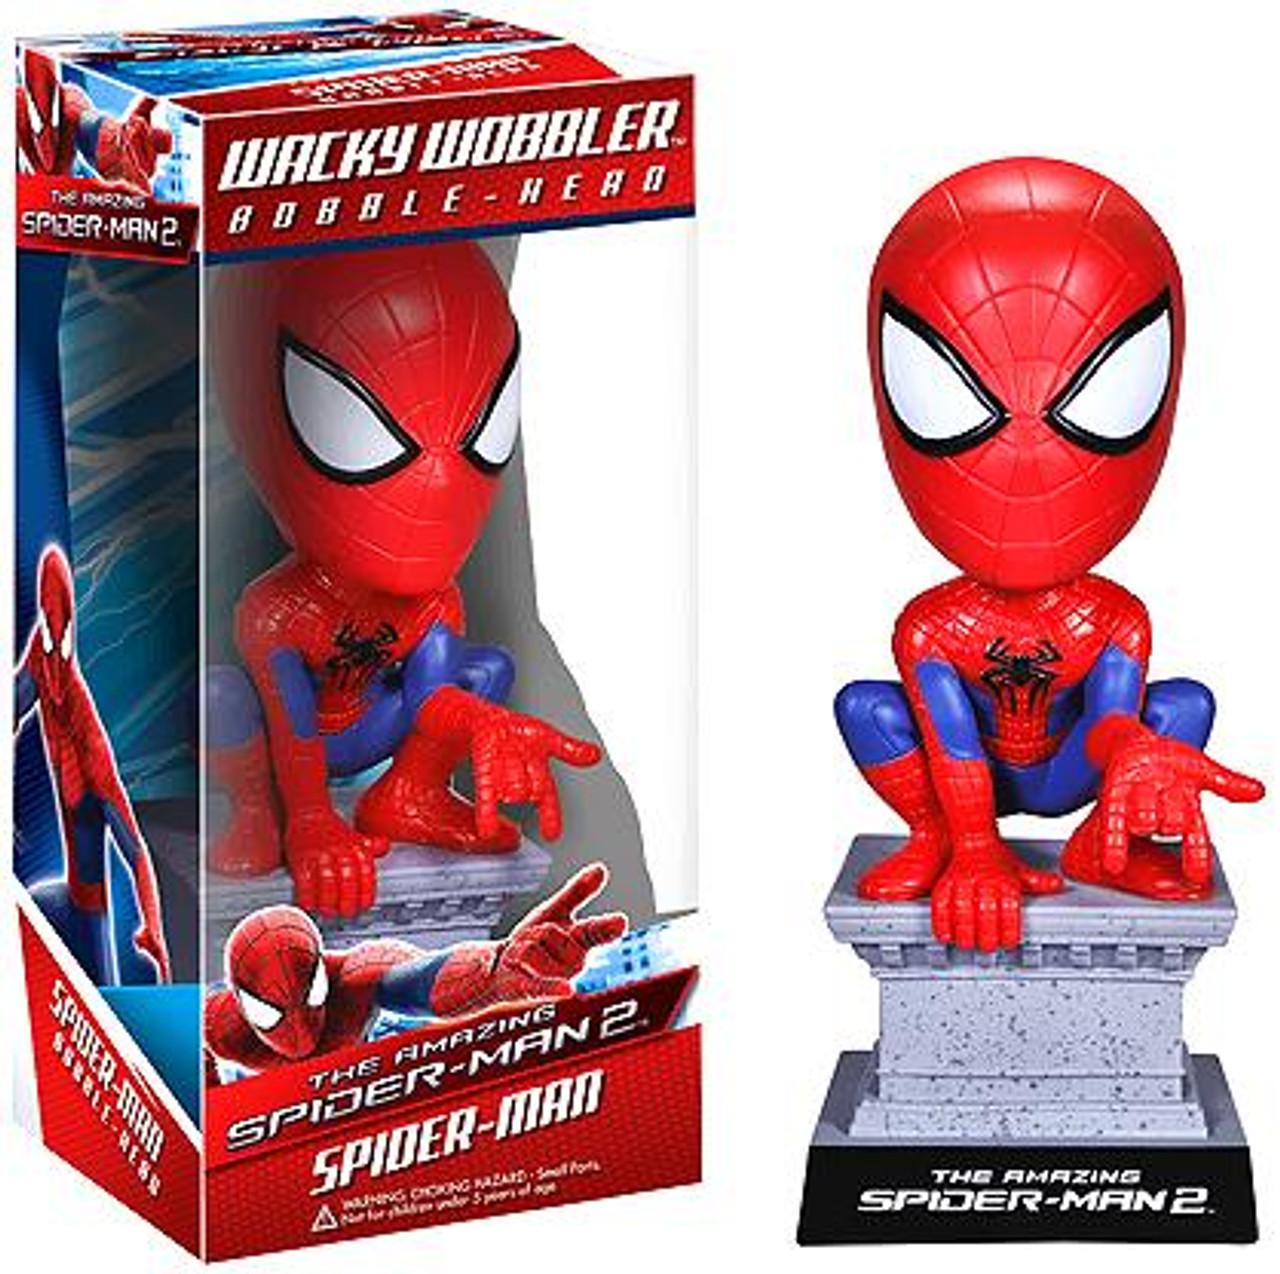 Funko The Amazing Spider-Man Wacky Wobbler Spider-Man Bobble Head [The Amazing Spider-Man 2]